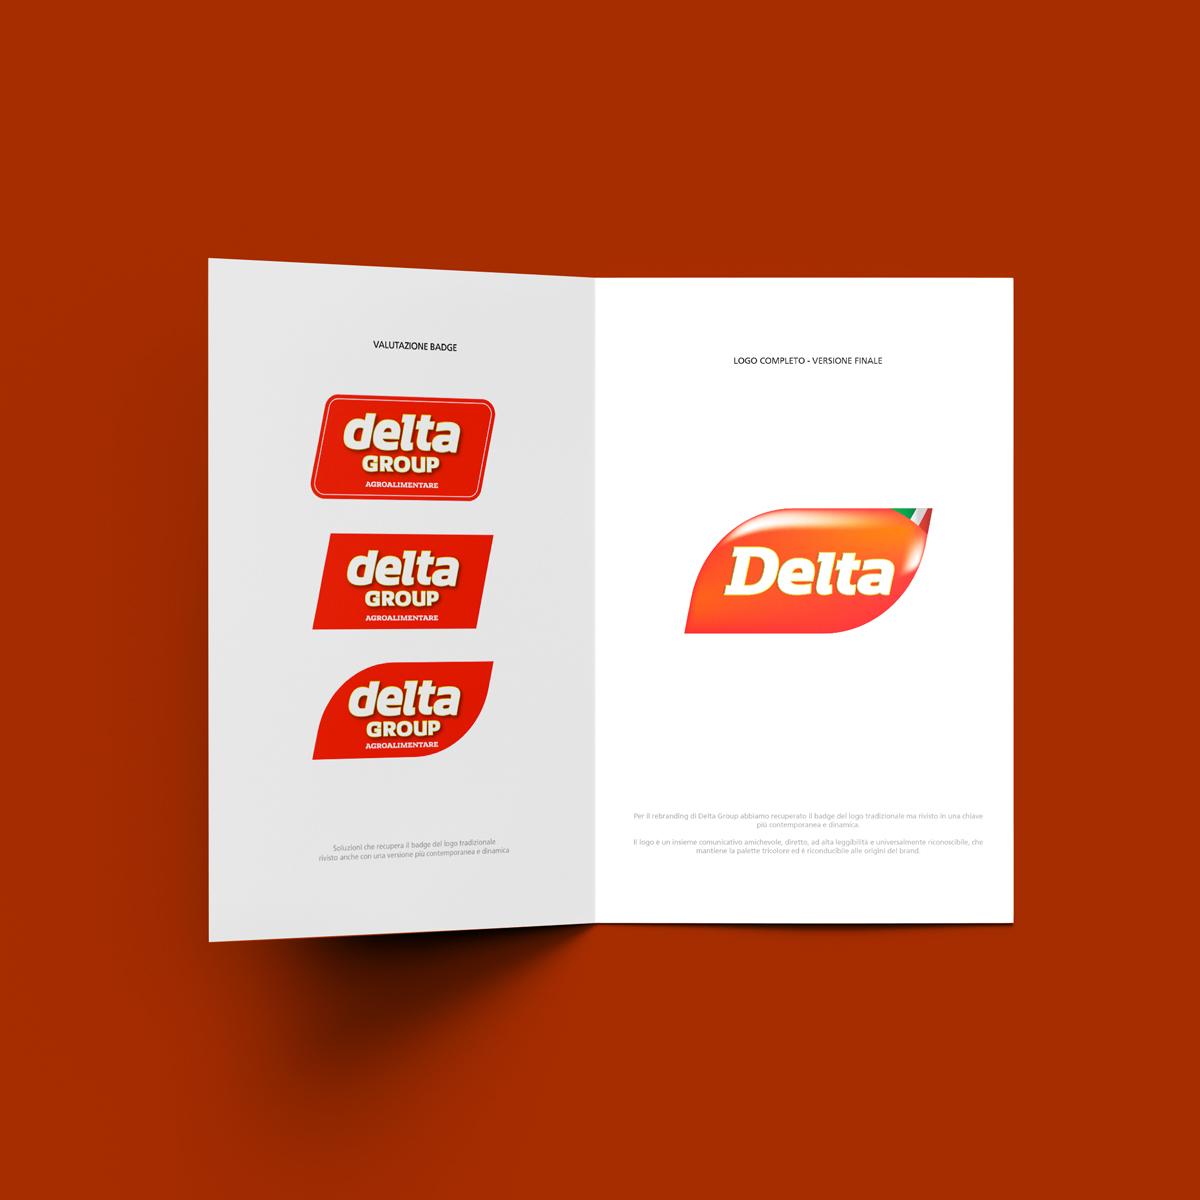 Studio grafica Verona - Restyling logo, Brand identity - Delta Group   OIS